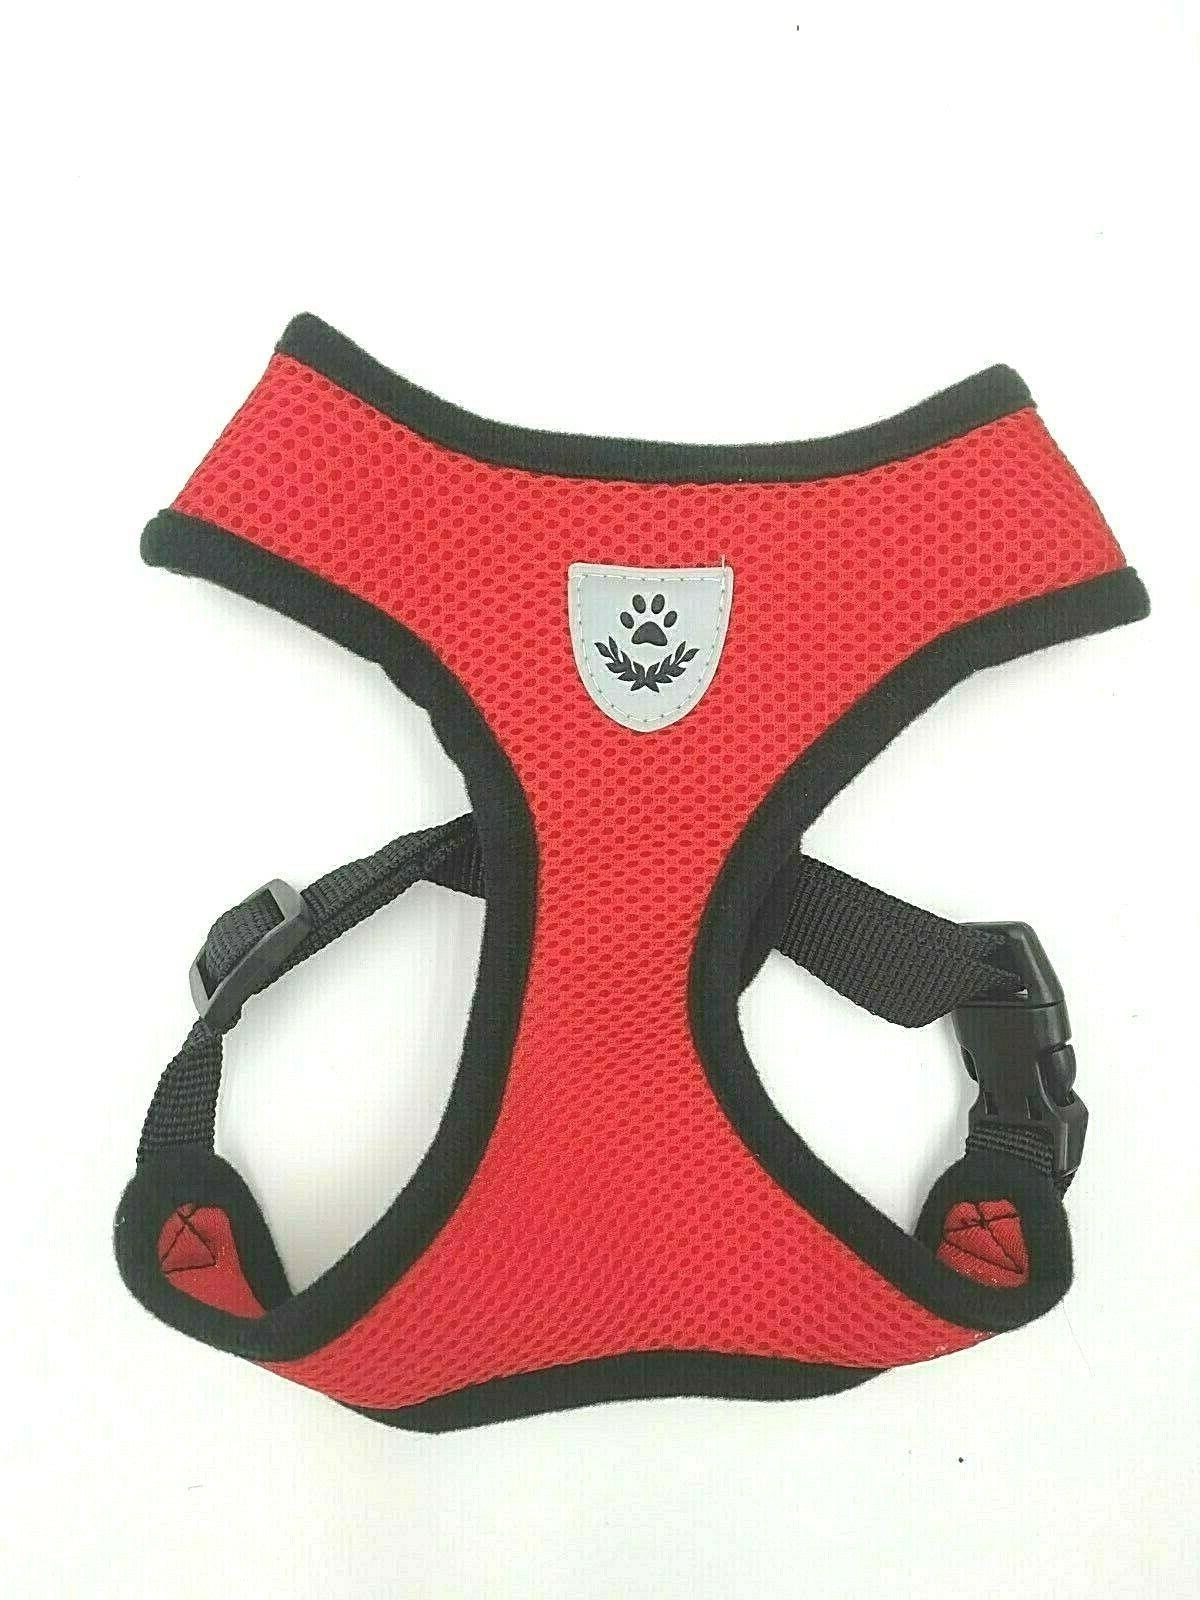 Pet SMALL Dog Harness Soft Walk Vest